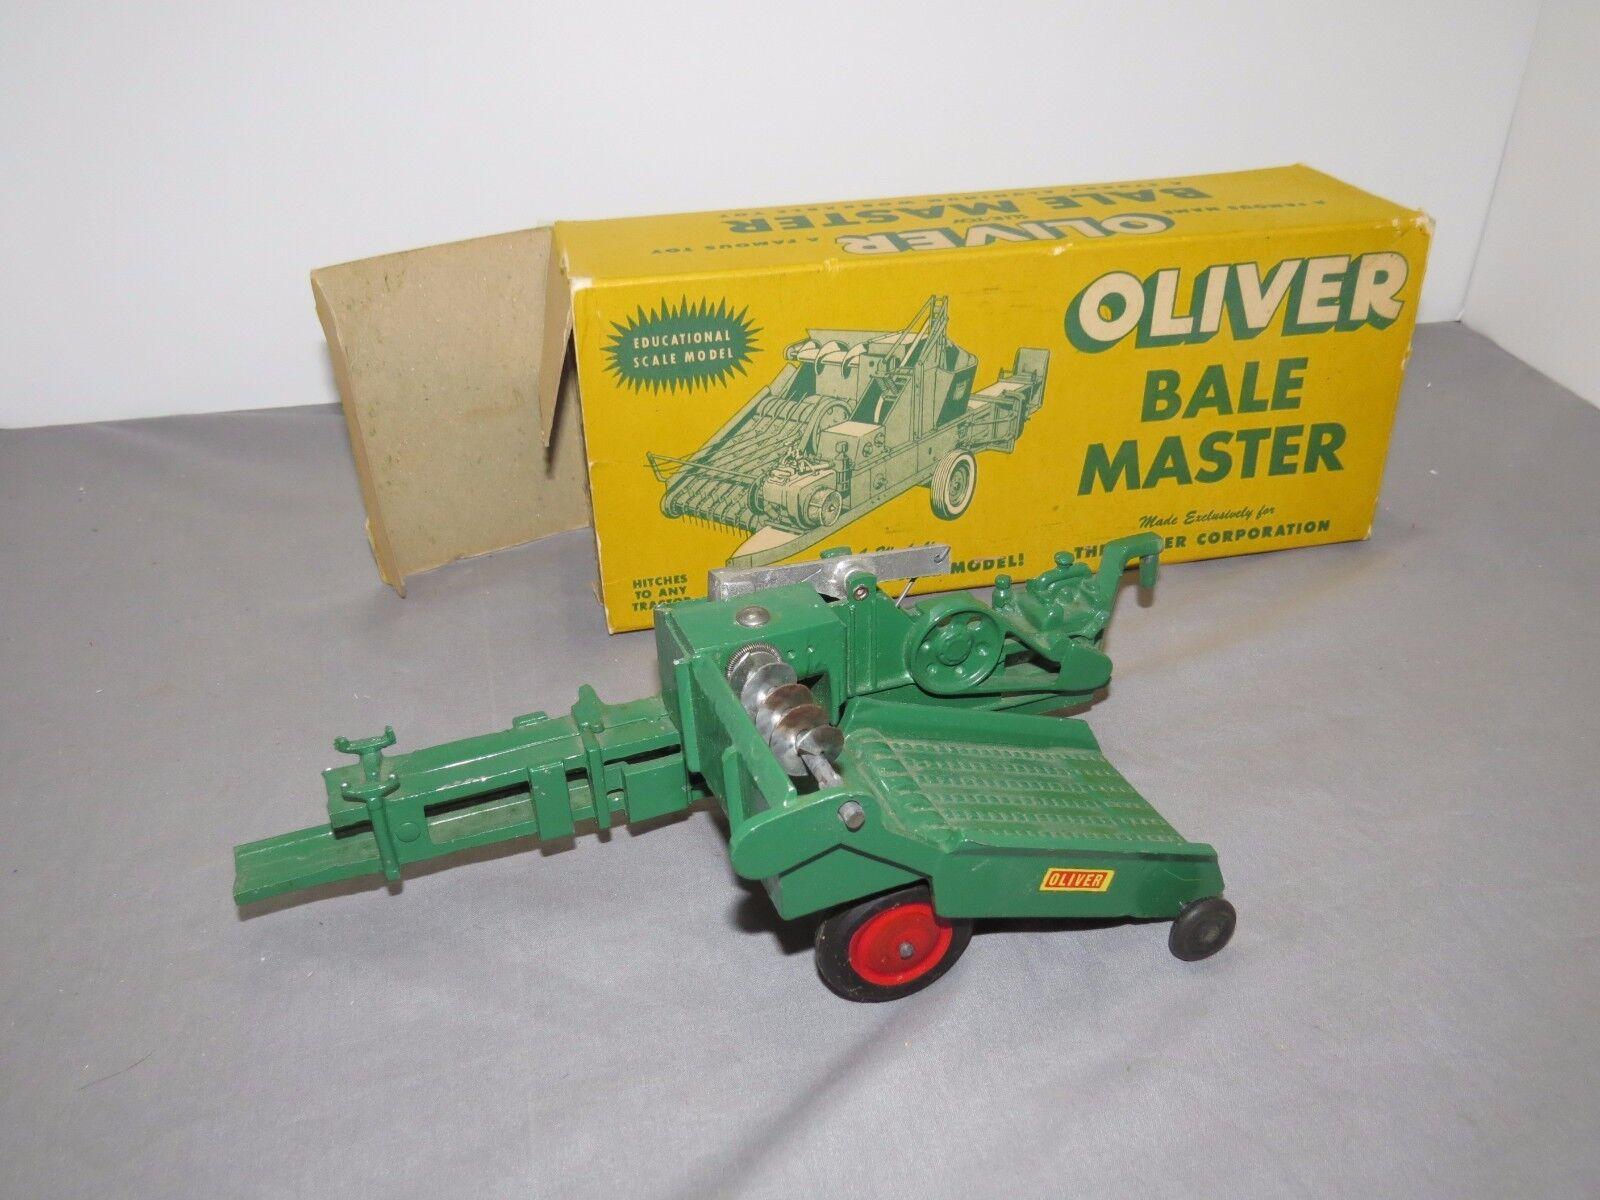 Vintage Oliver Bale Master Empacadora Slik Slik Empacadora Juguete